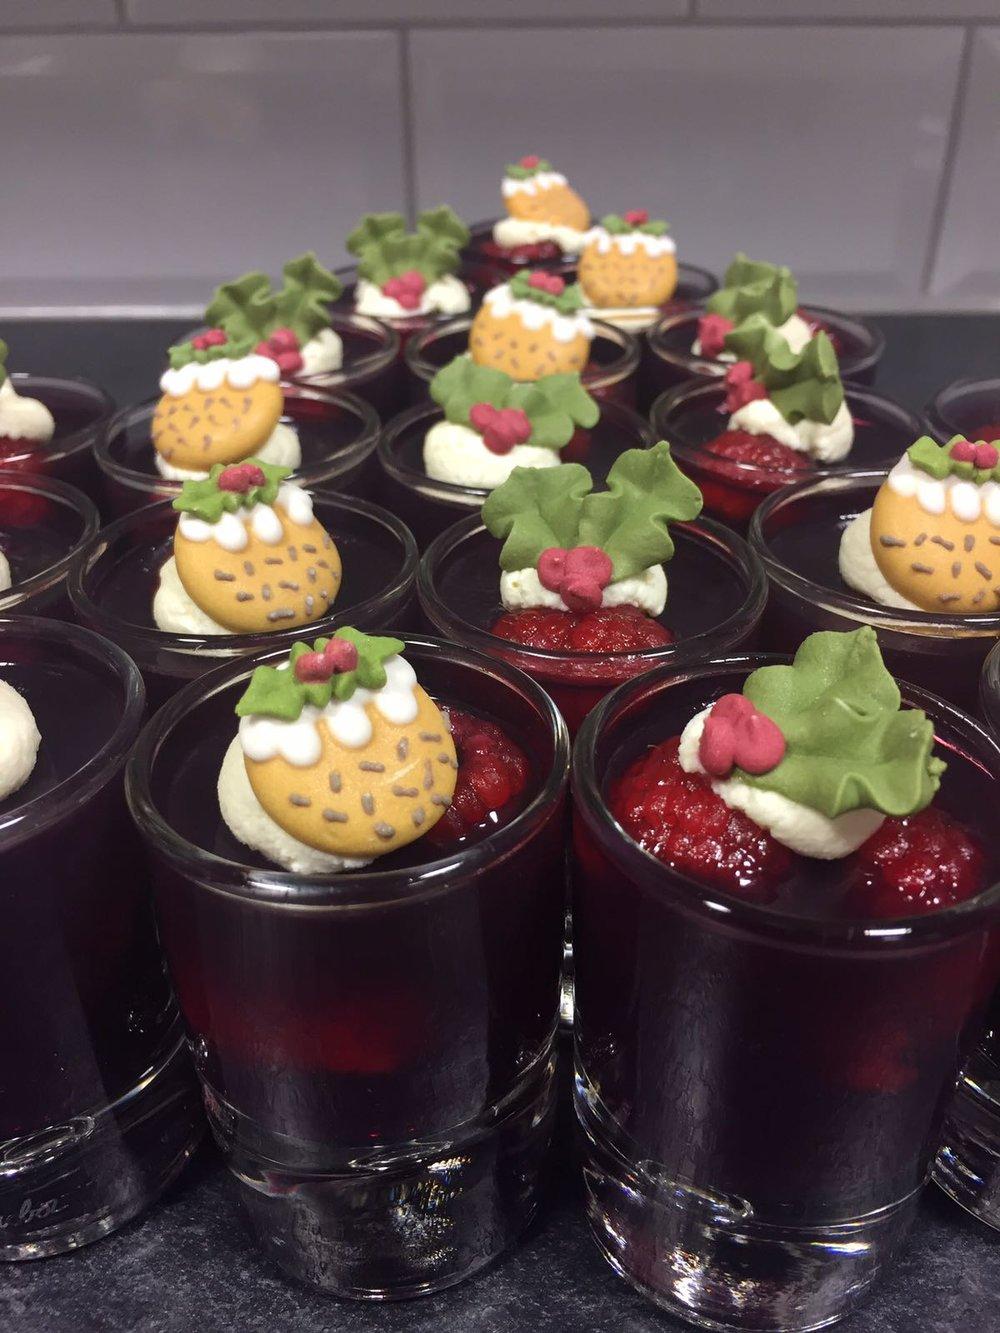 puddings-sarah-symington-catering-10.JPG